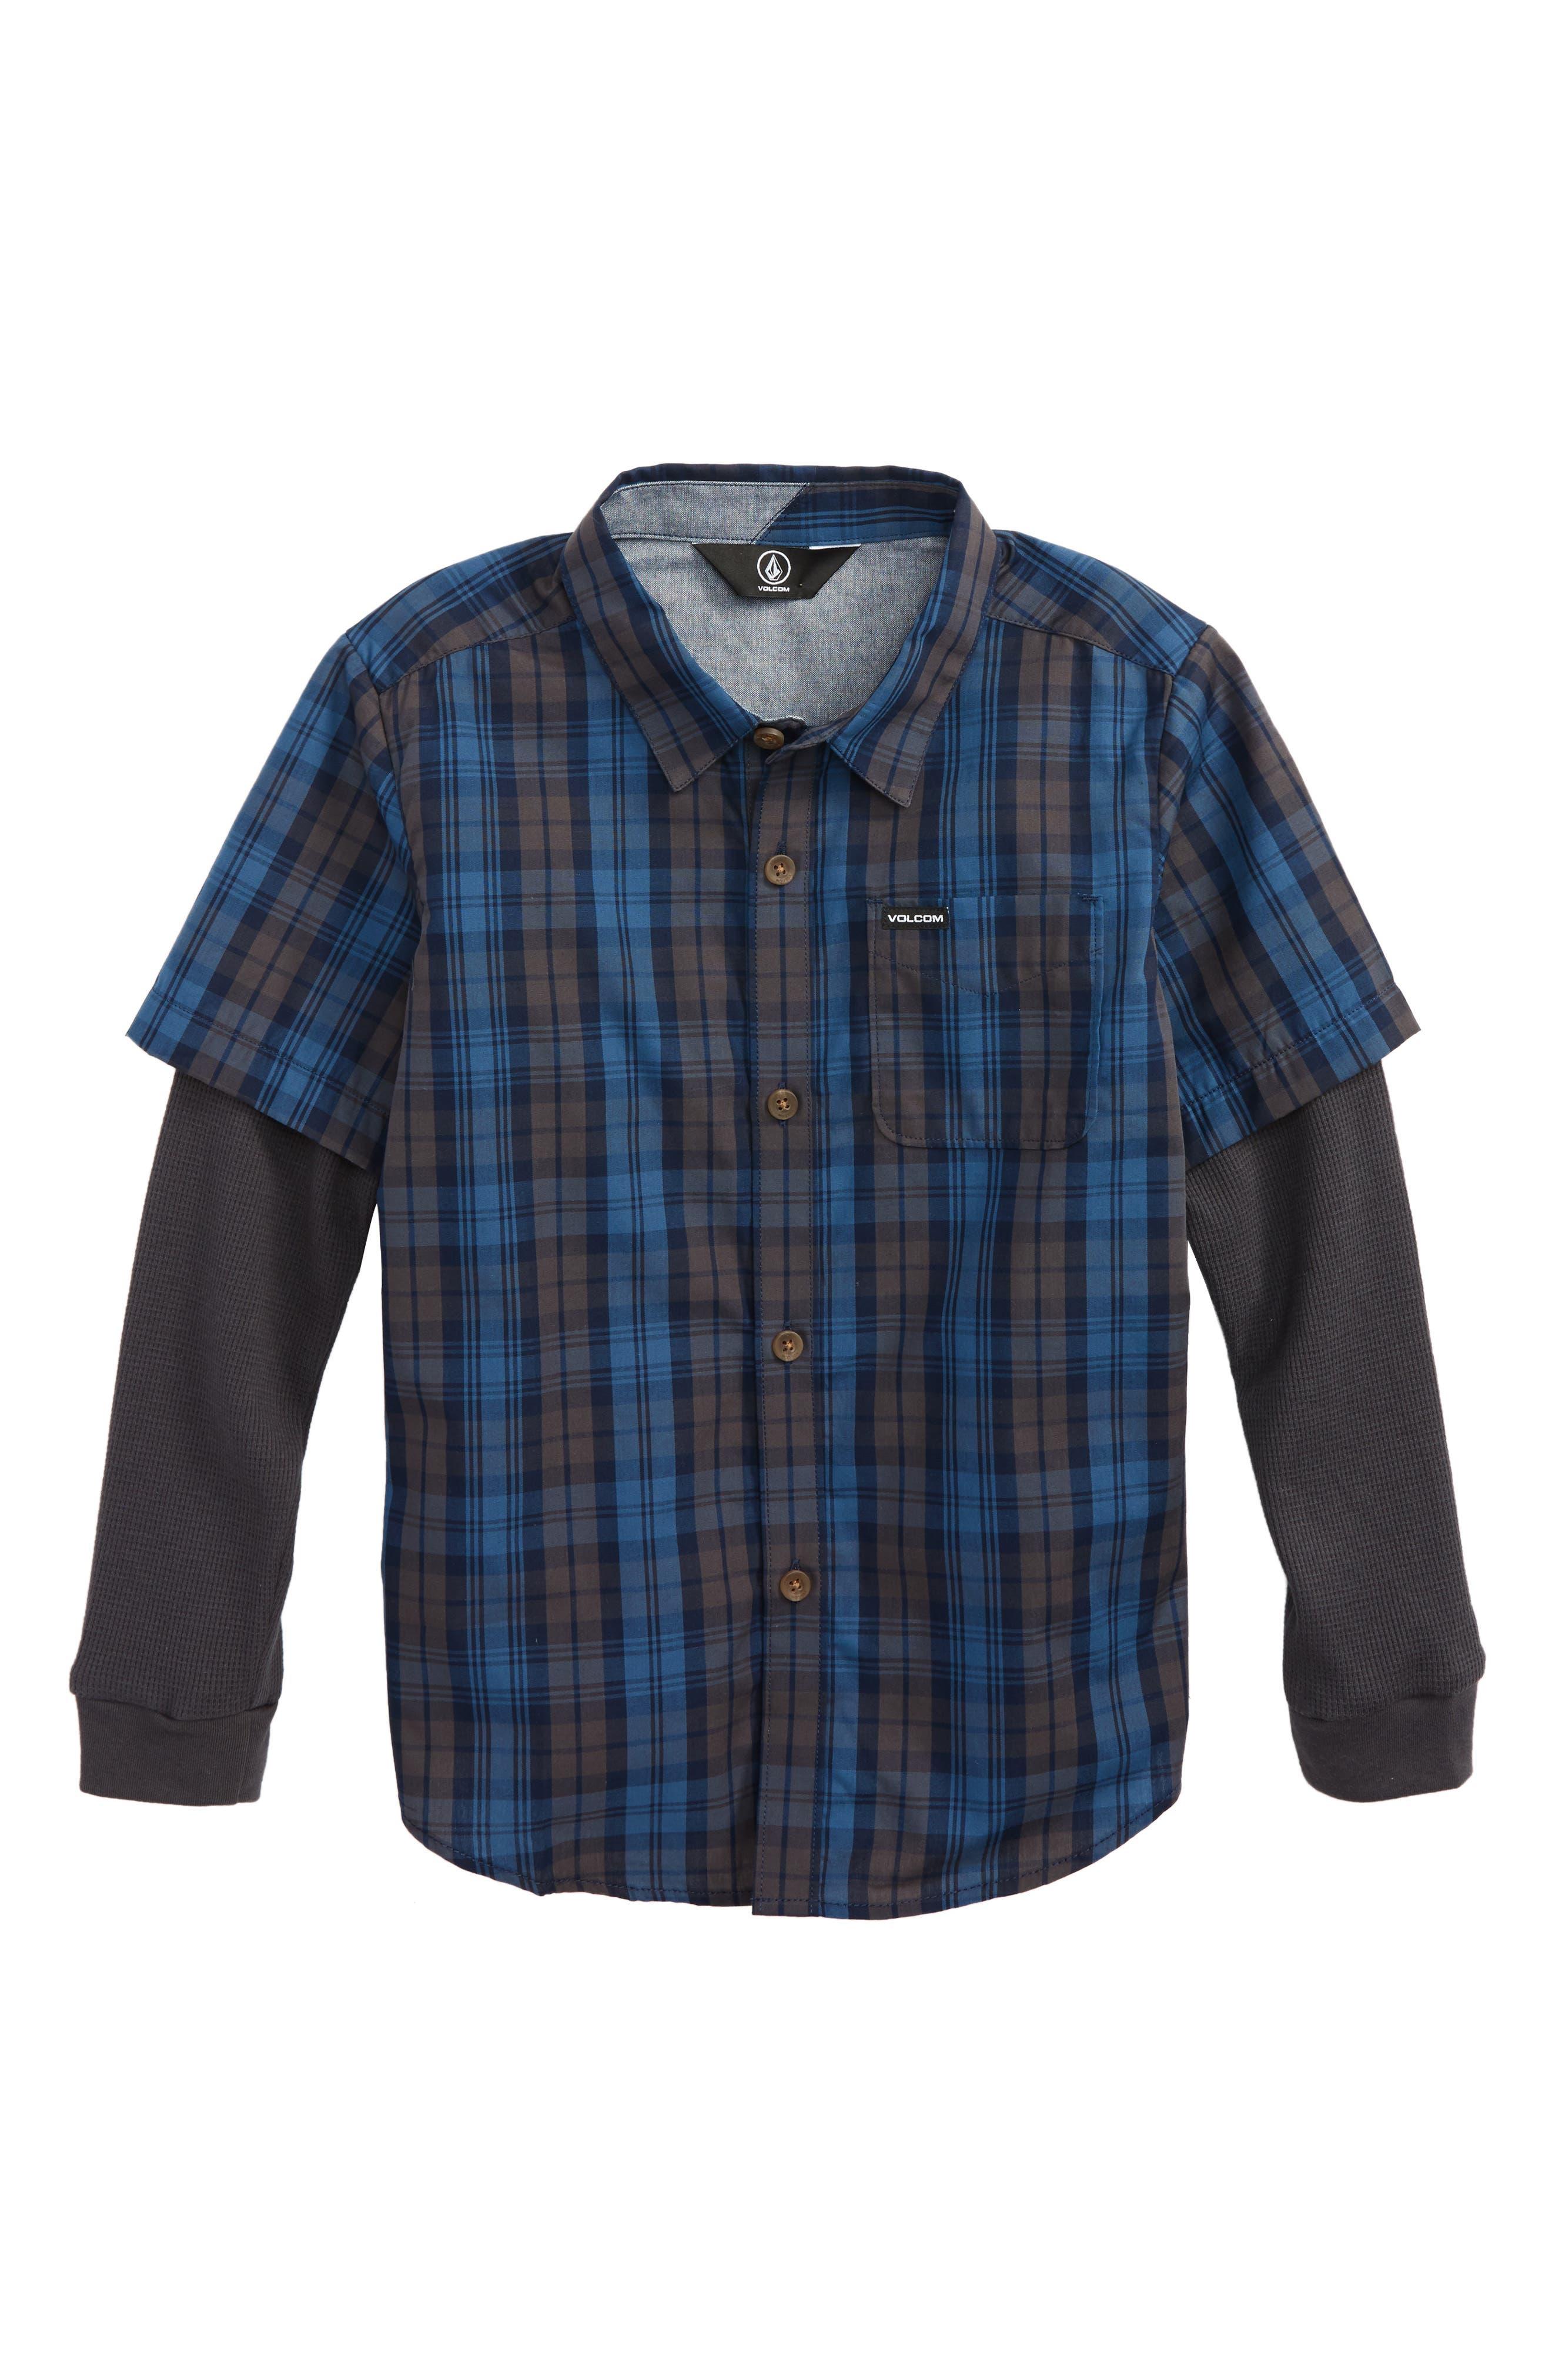 Ignition Layered Woven Shirt,                         Main,                         color, Indigo